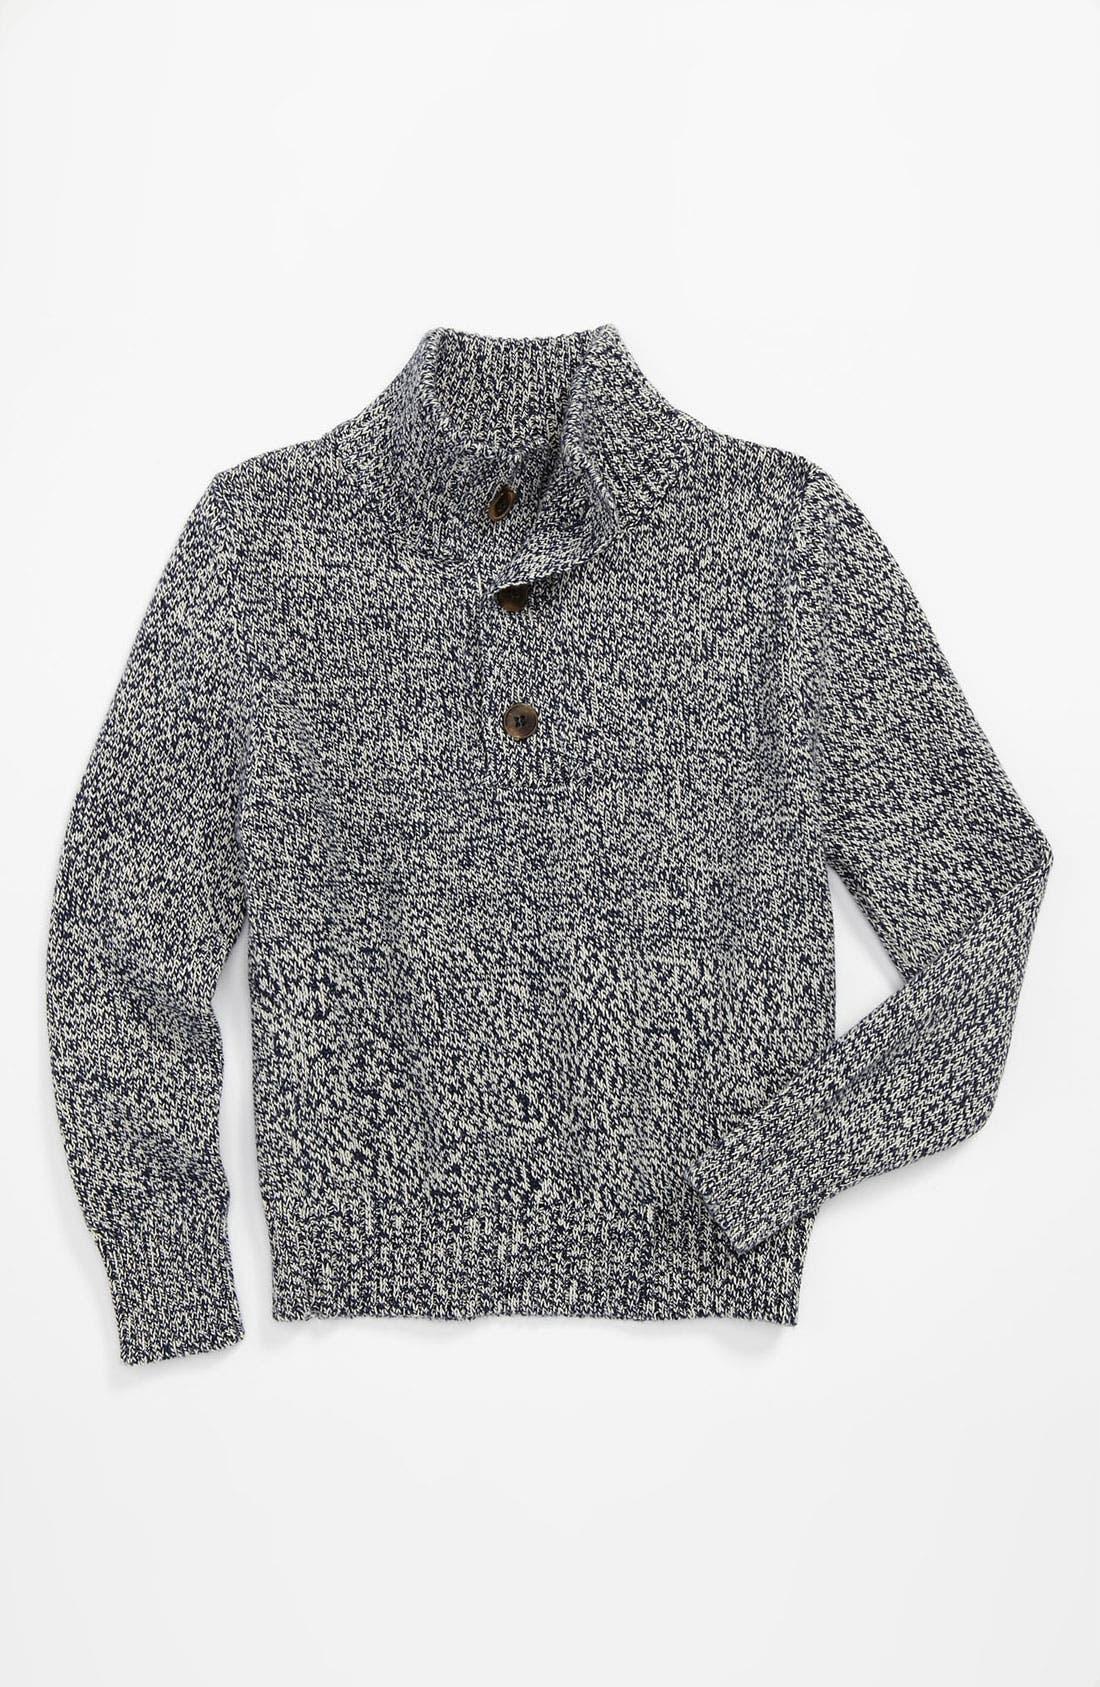 Main Image - Peek 'Nathan' Marled Mockneck Sweater (Toddler, Little Boys & Big Boys)